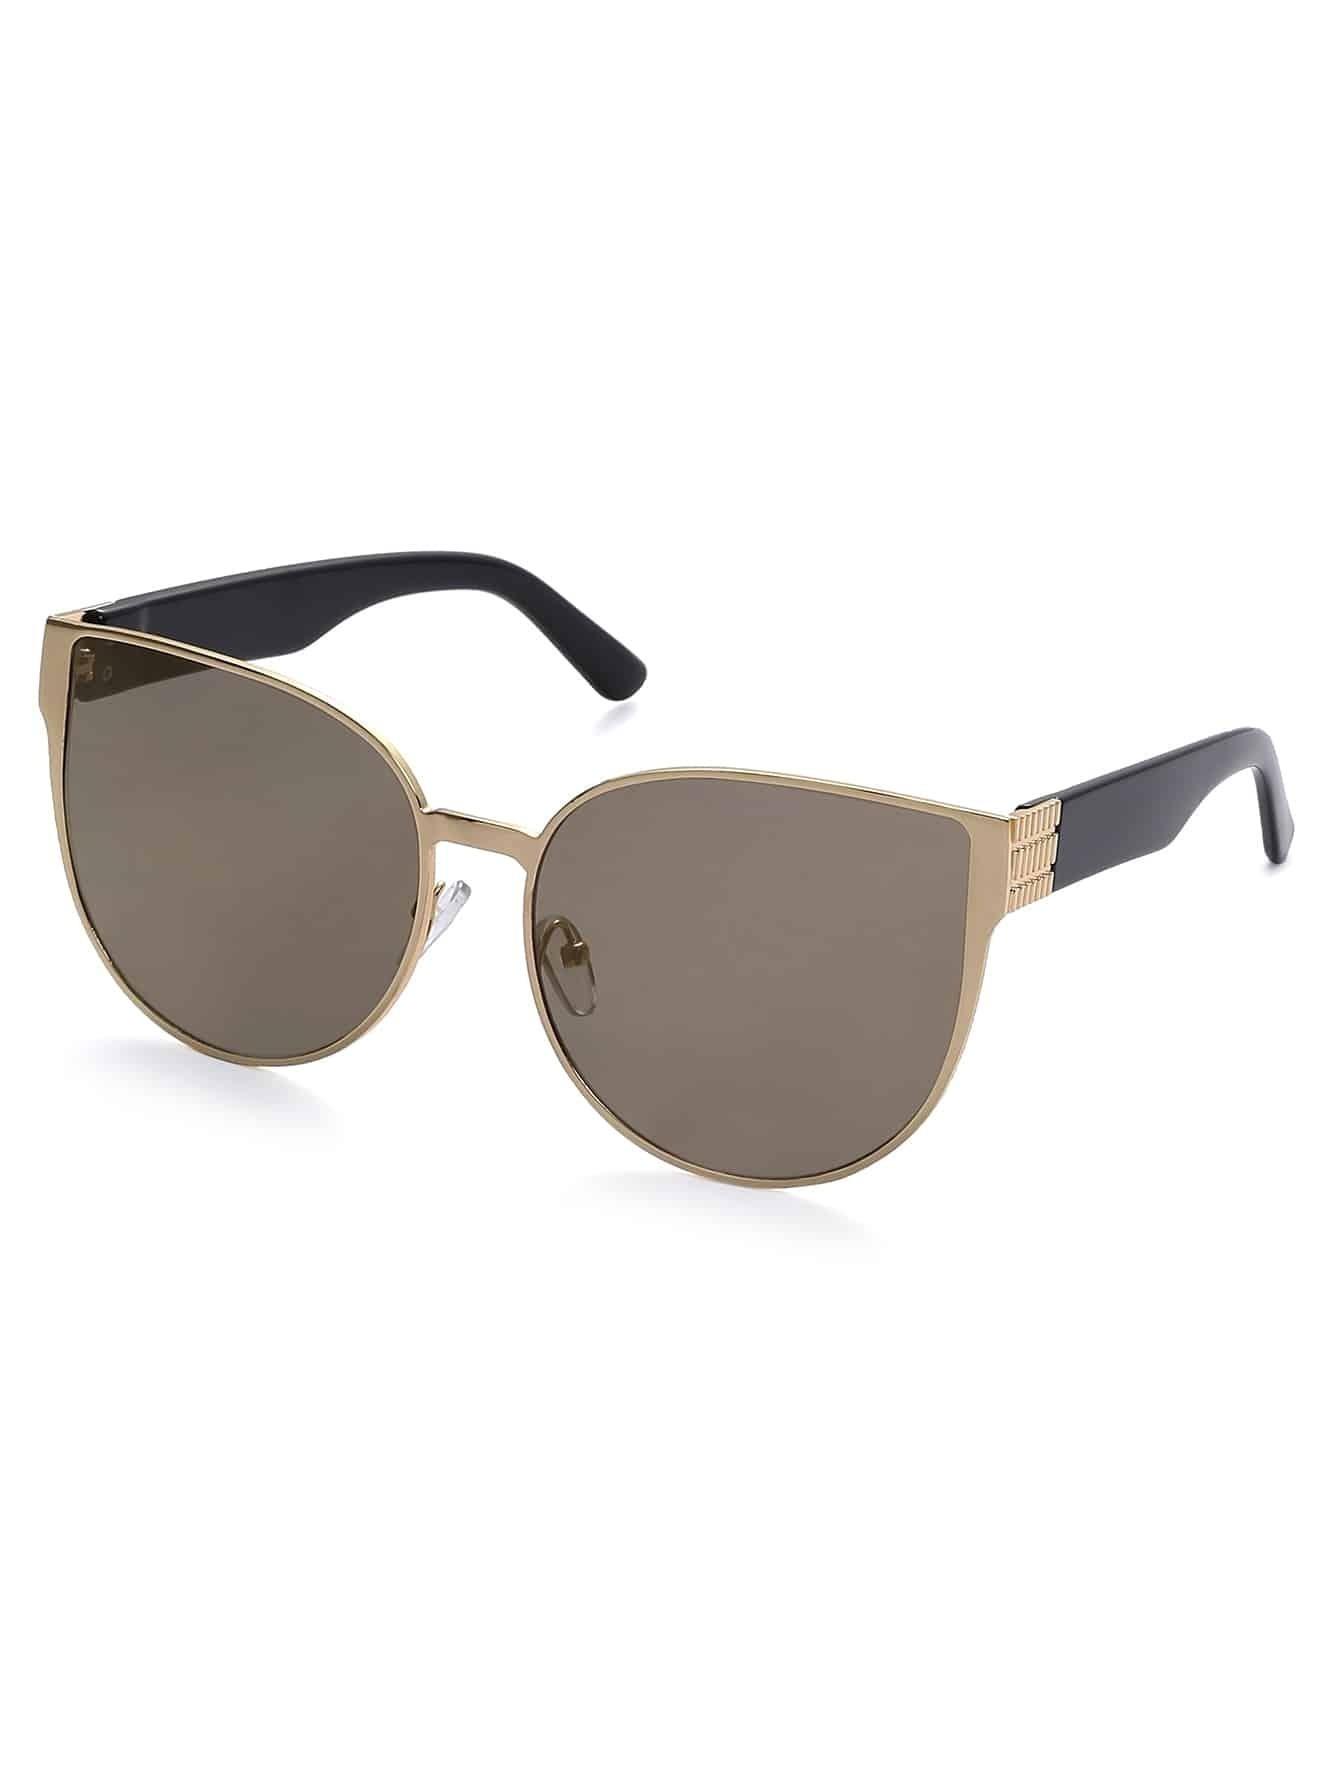 Gold Frame Cat Eye Sunglasses : Gold Metal Frame Vintage Cat Eye Sunglasses